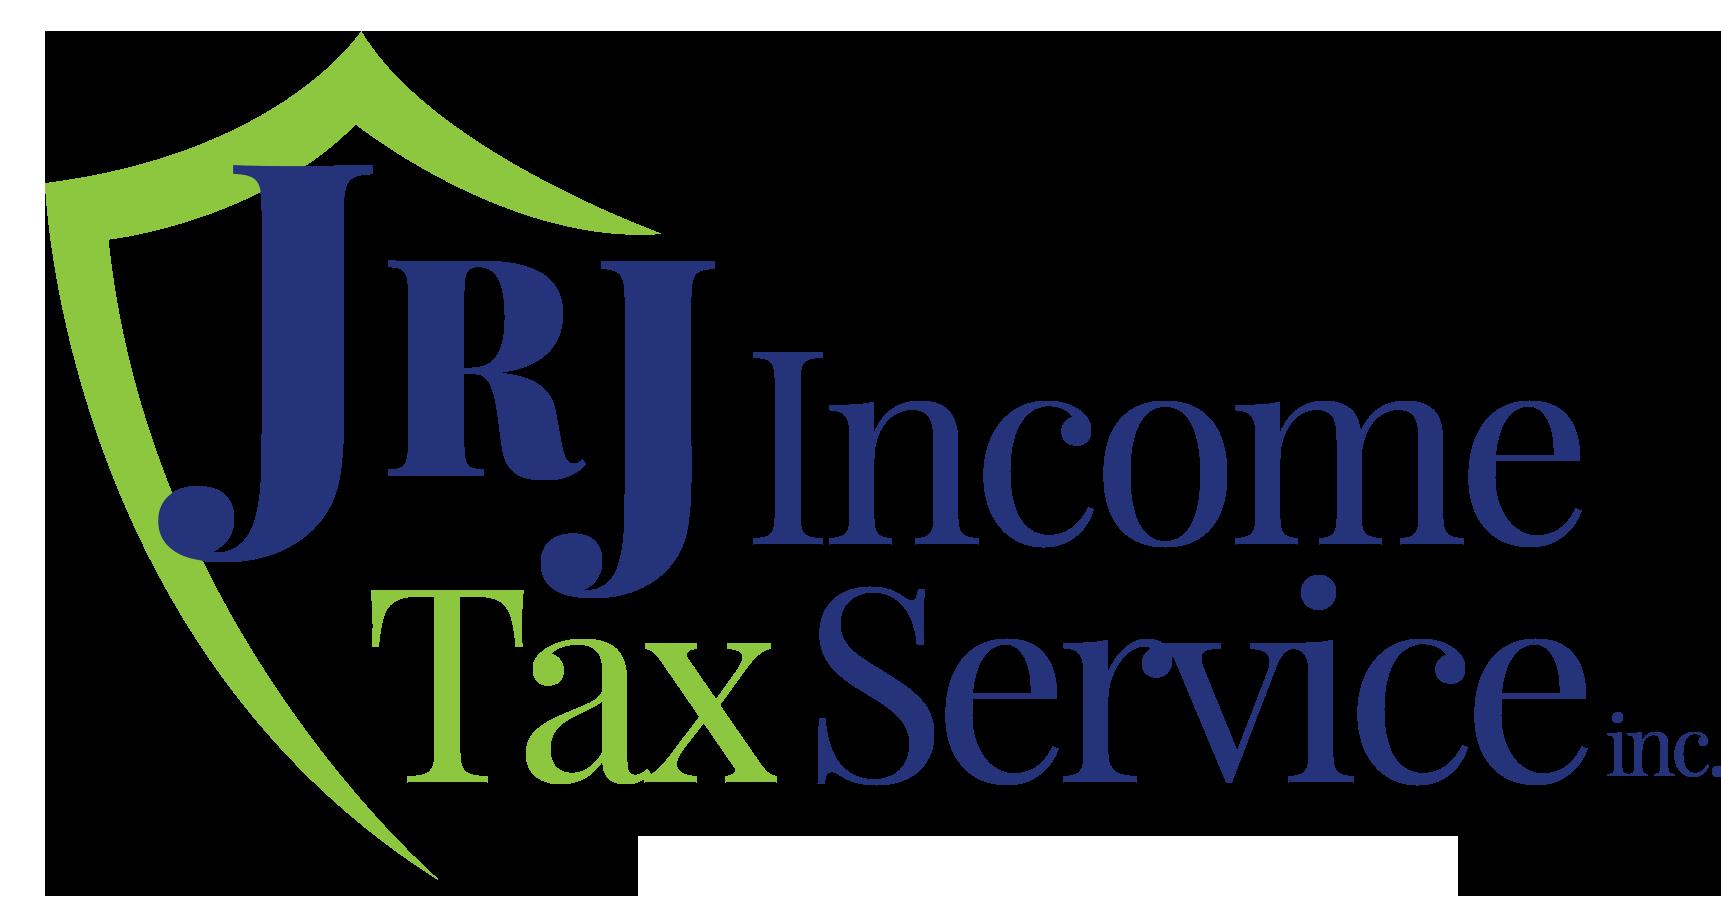 JRJ Income Tax Serice